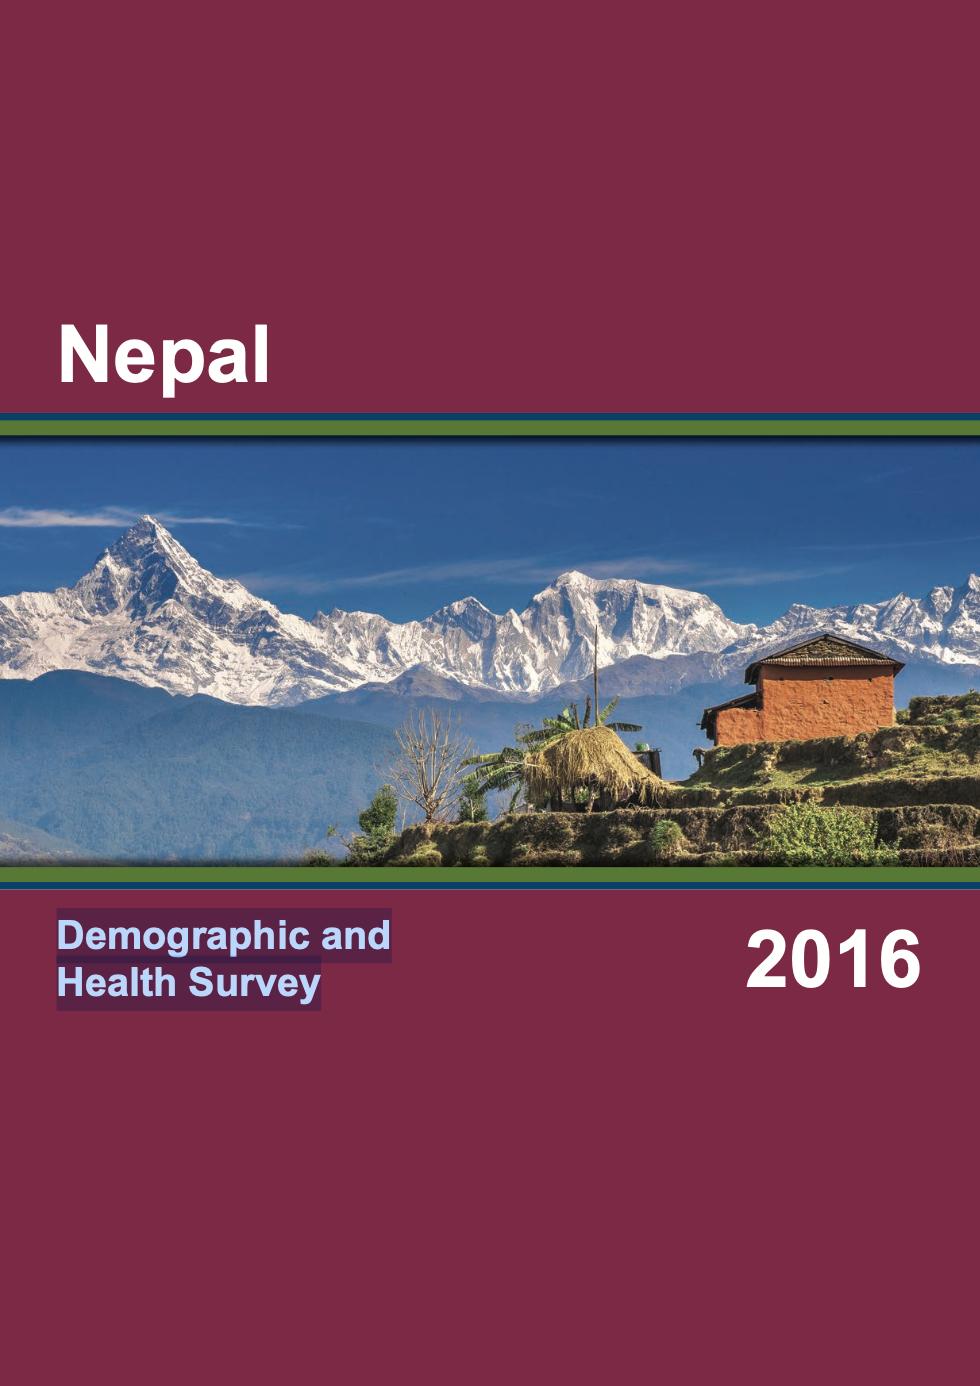 Nepal Demographic and Health Survey 2016